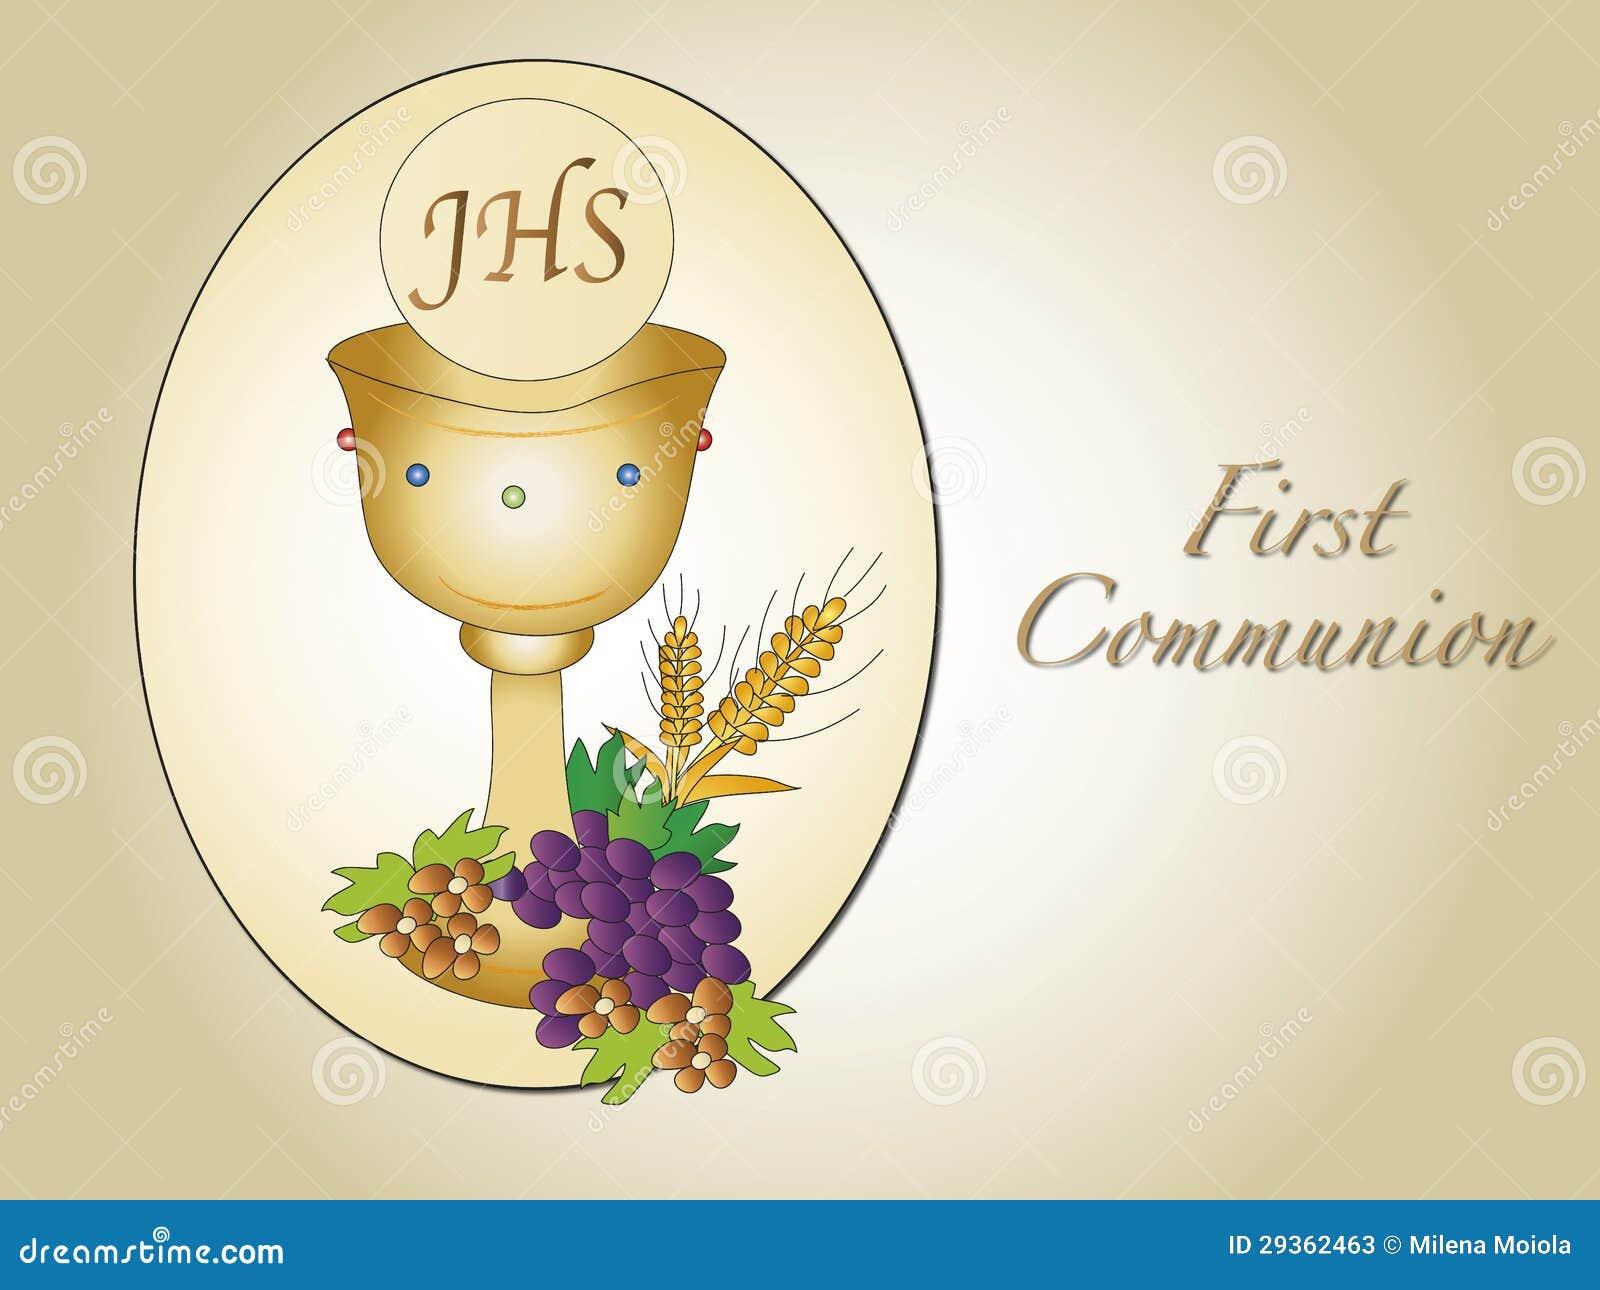 christian holy communion clip art